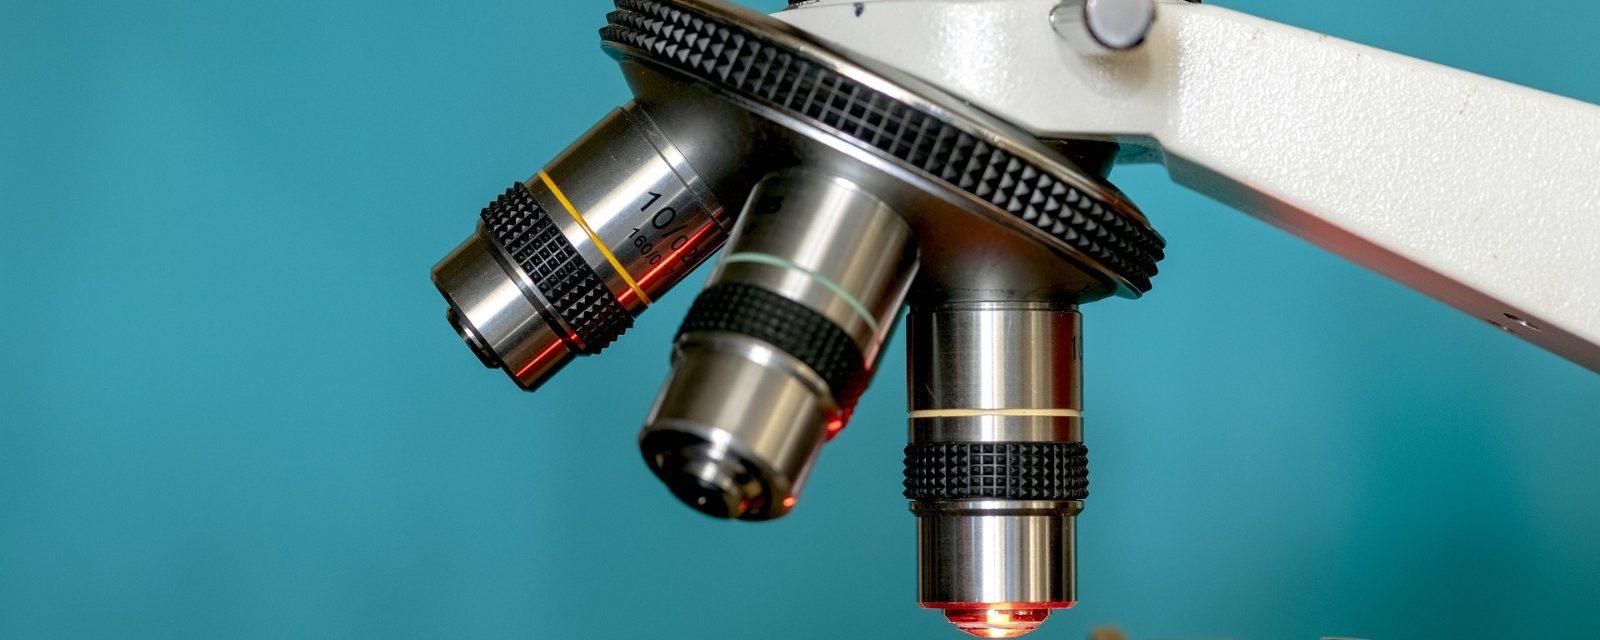 El microscopio espiritual